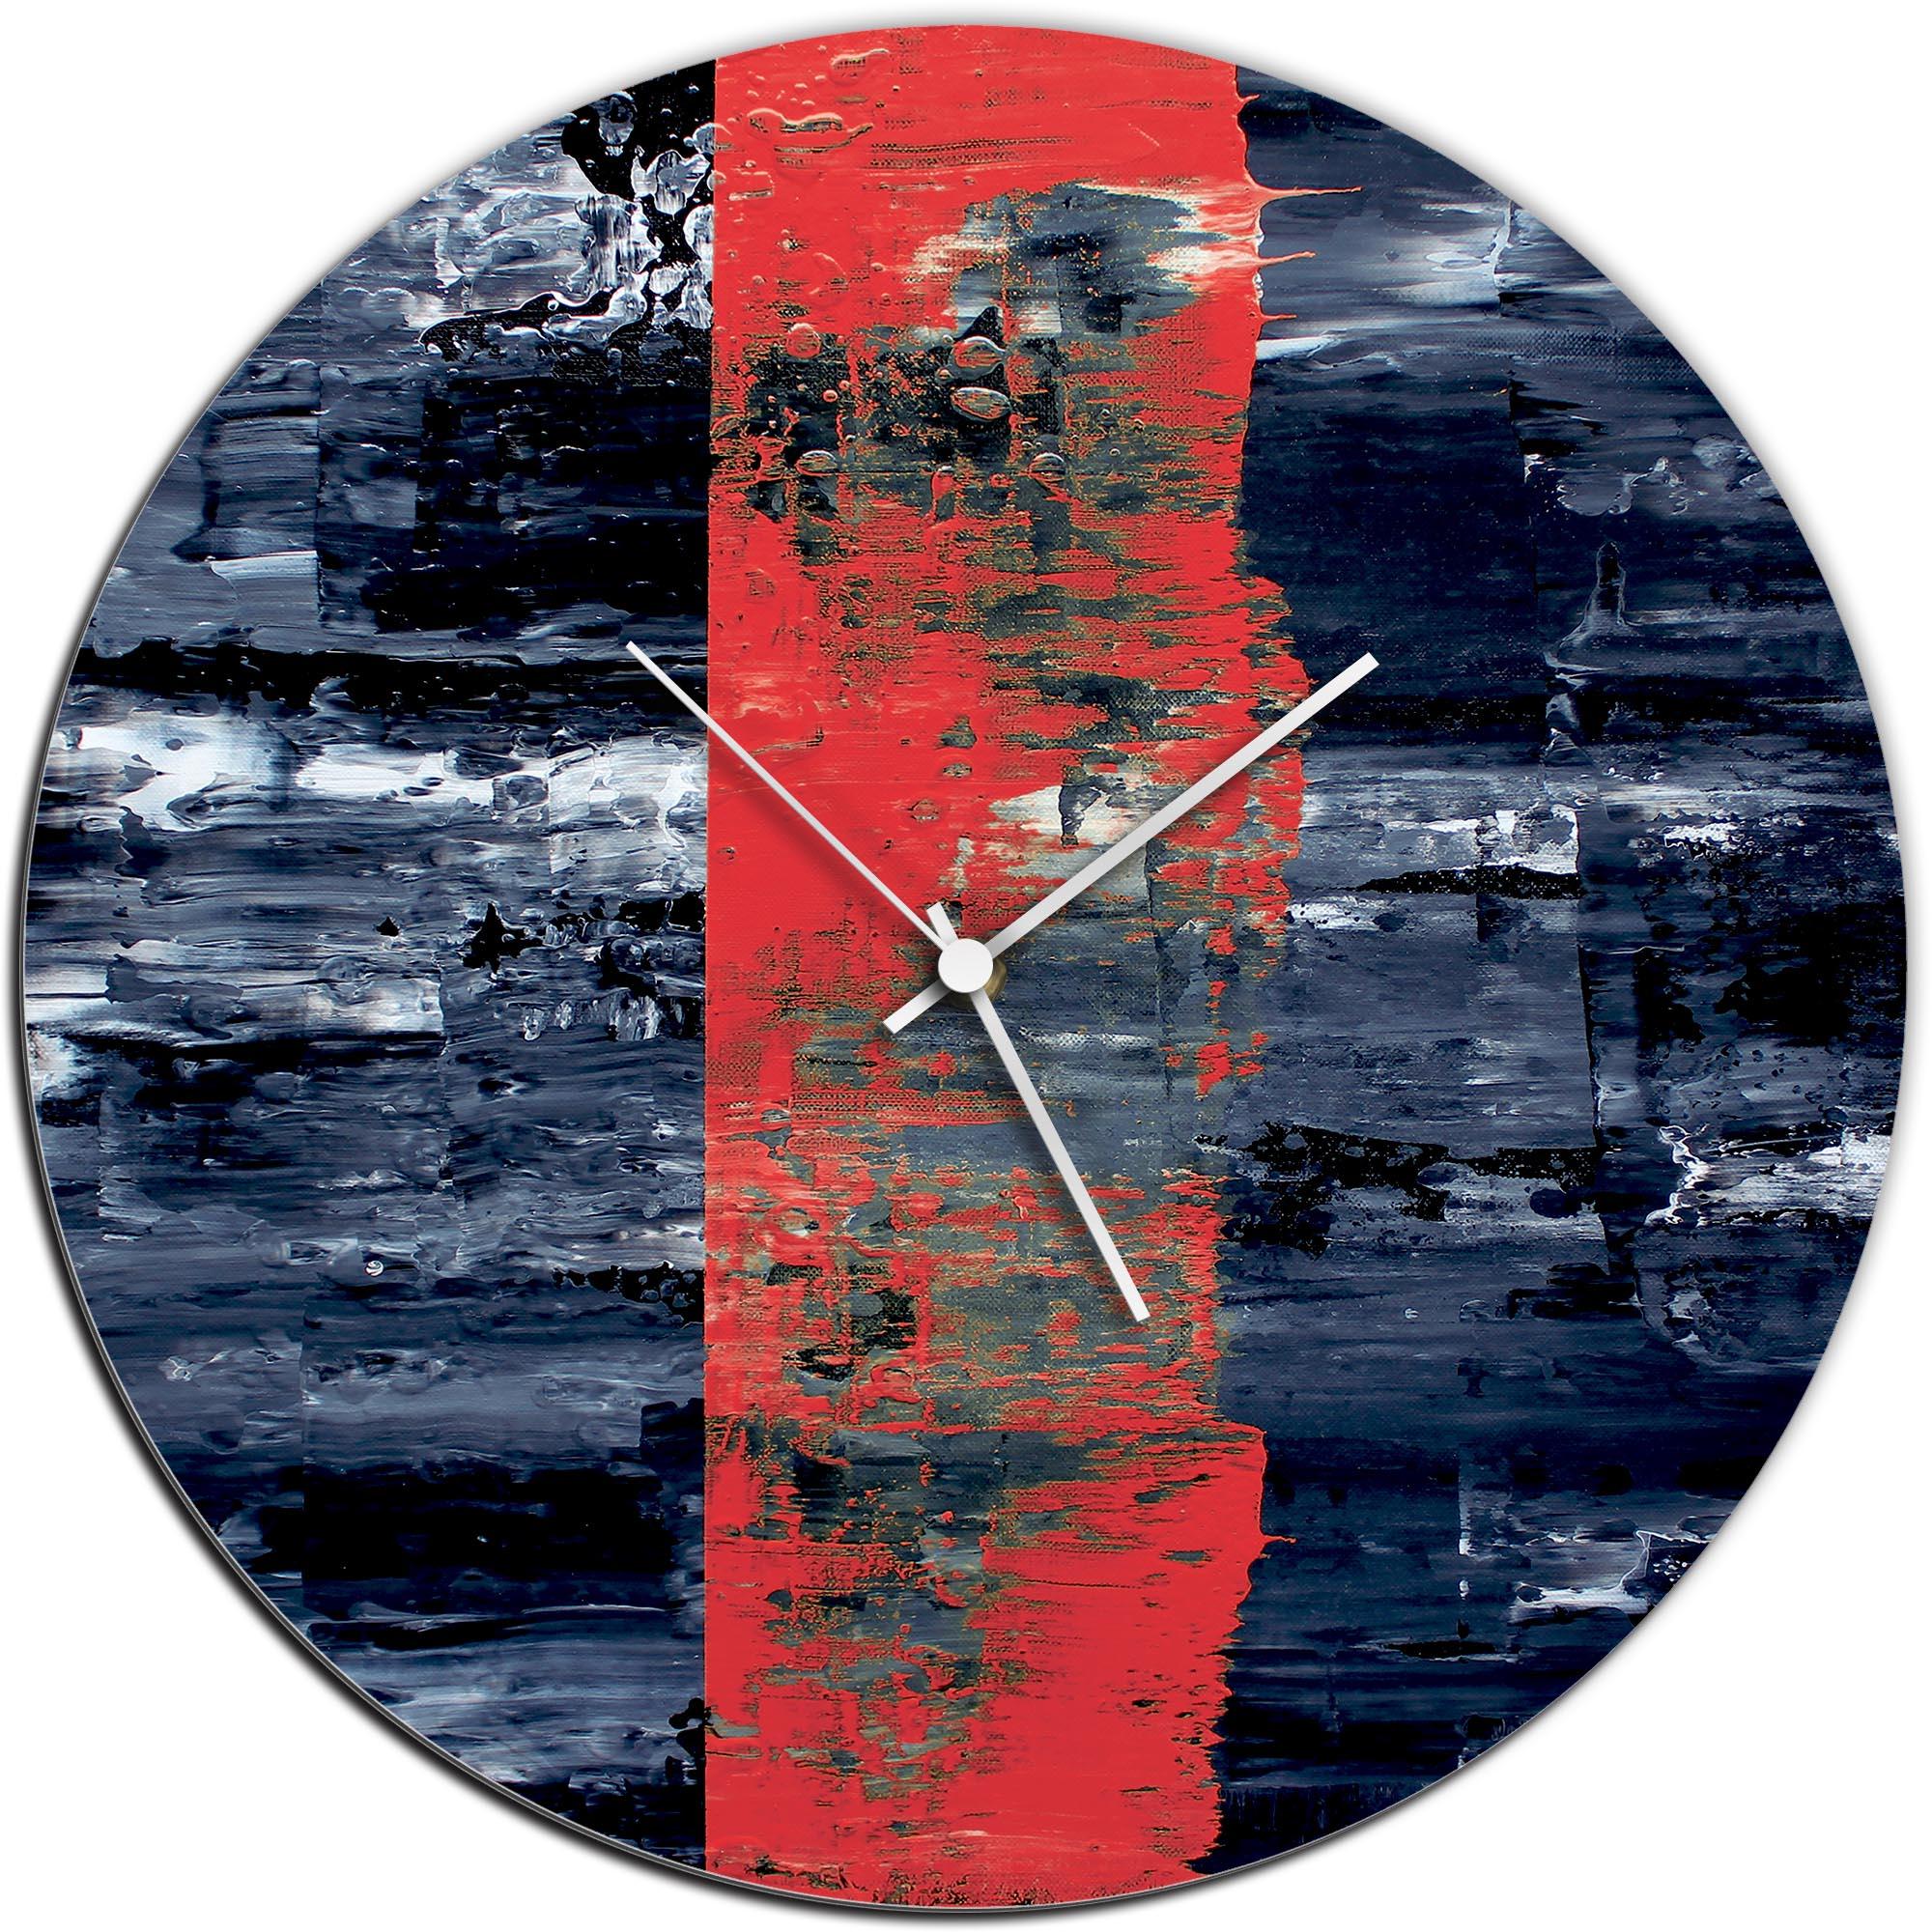 Mendo Vasilevski 'Red Line Circle Clock Large' 22in x 22in Modern Wall Clock on Aluminum Composite